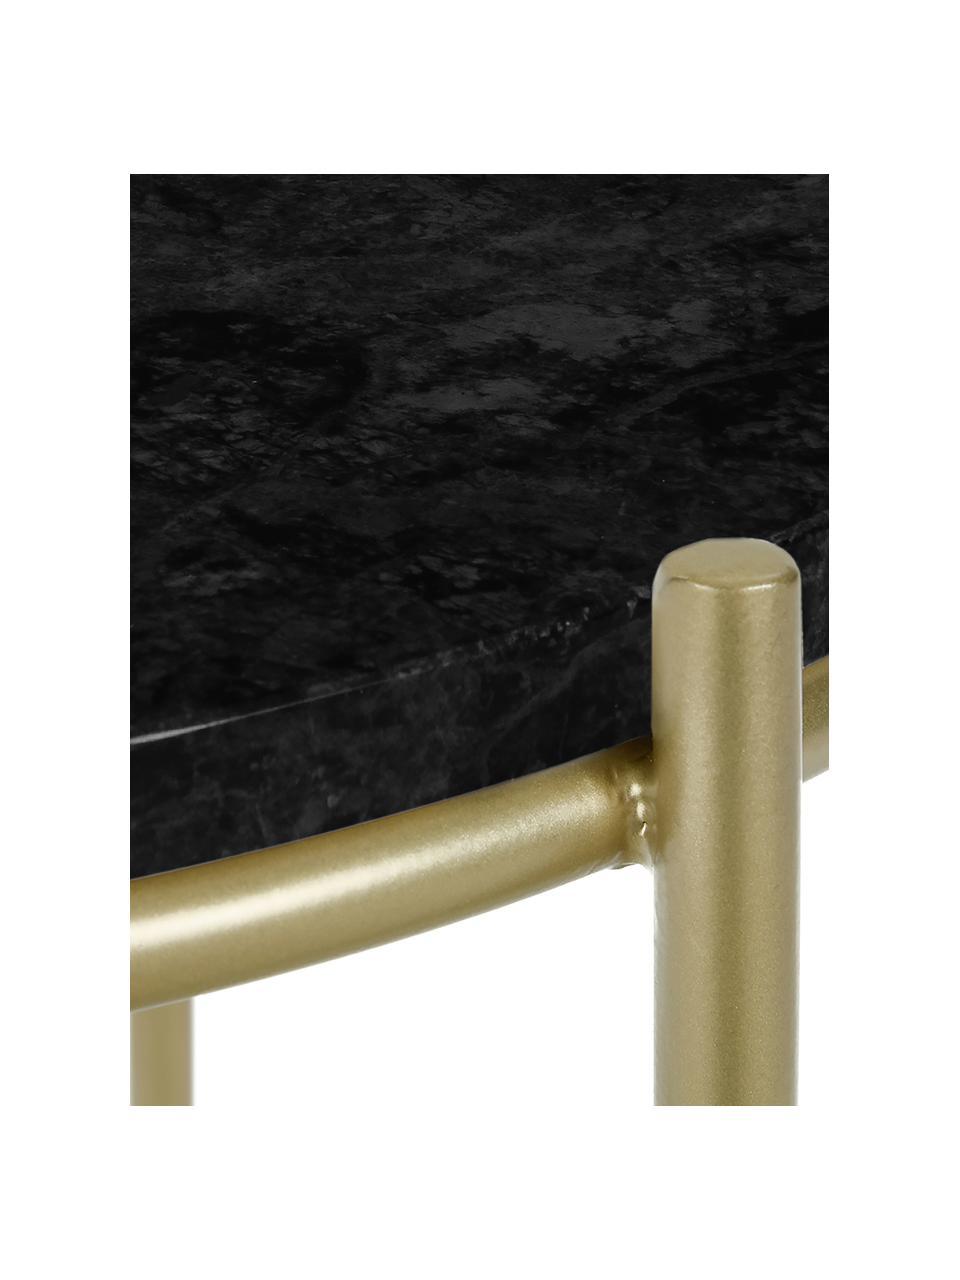 Ronde marmeren bijzettafel Ella, Tafelblad: marmer, Frame: gepoedercoat metaal, Tafelblad: zwart marmer Frame: mat goudkleurig, Ø 40 x H 50 cm